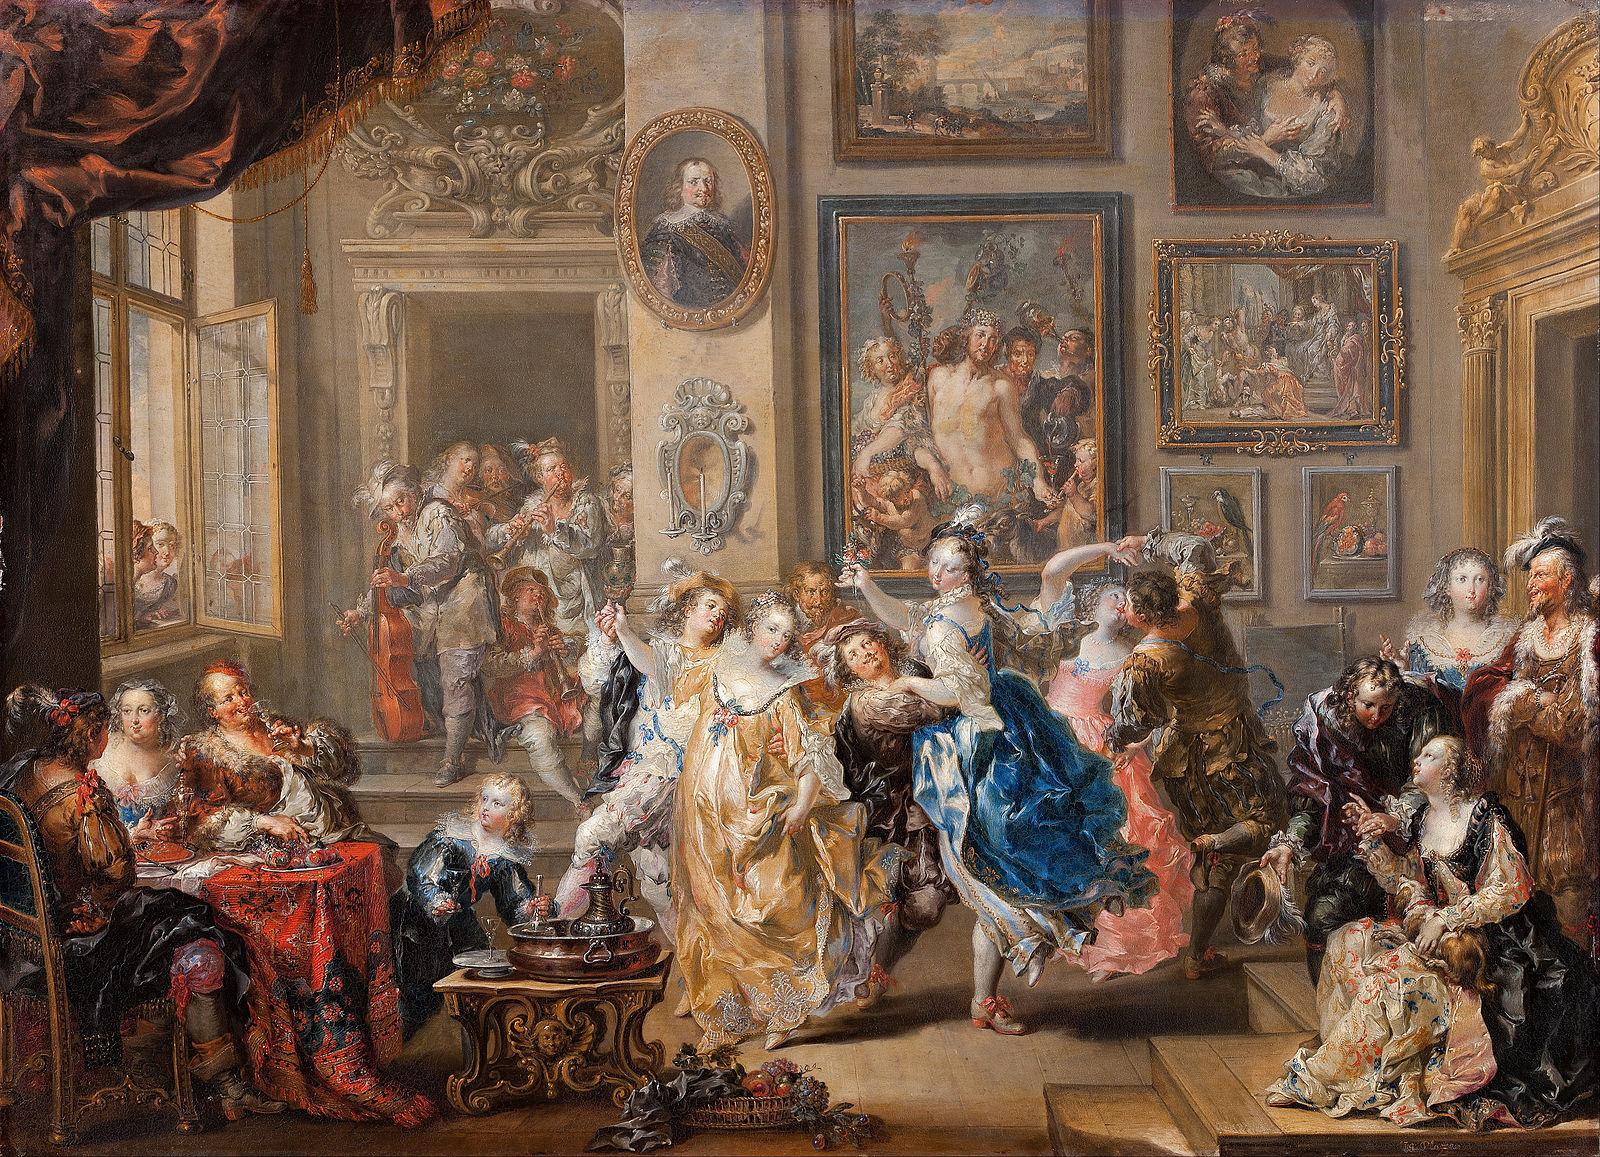 Johann_Georg_Platzer_-_Dancing_scene_with_palace_interior_-_Google_Art_Project.jpg